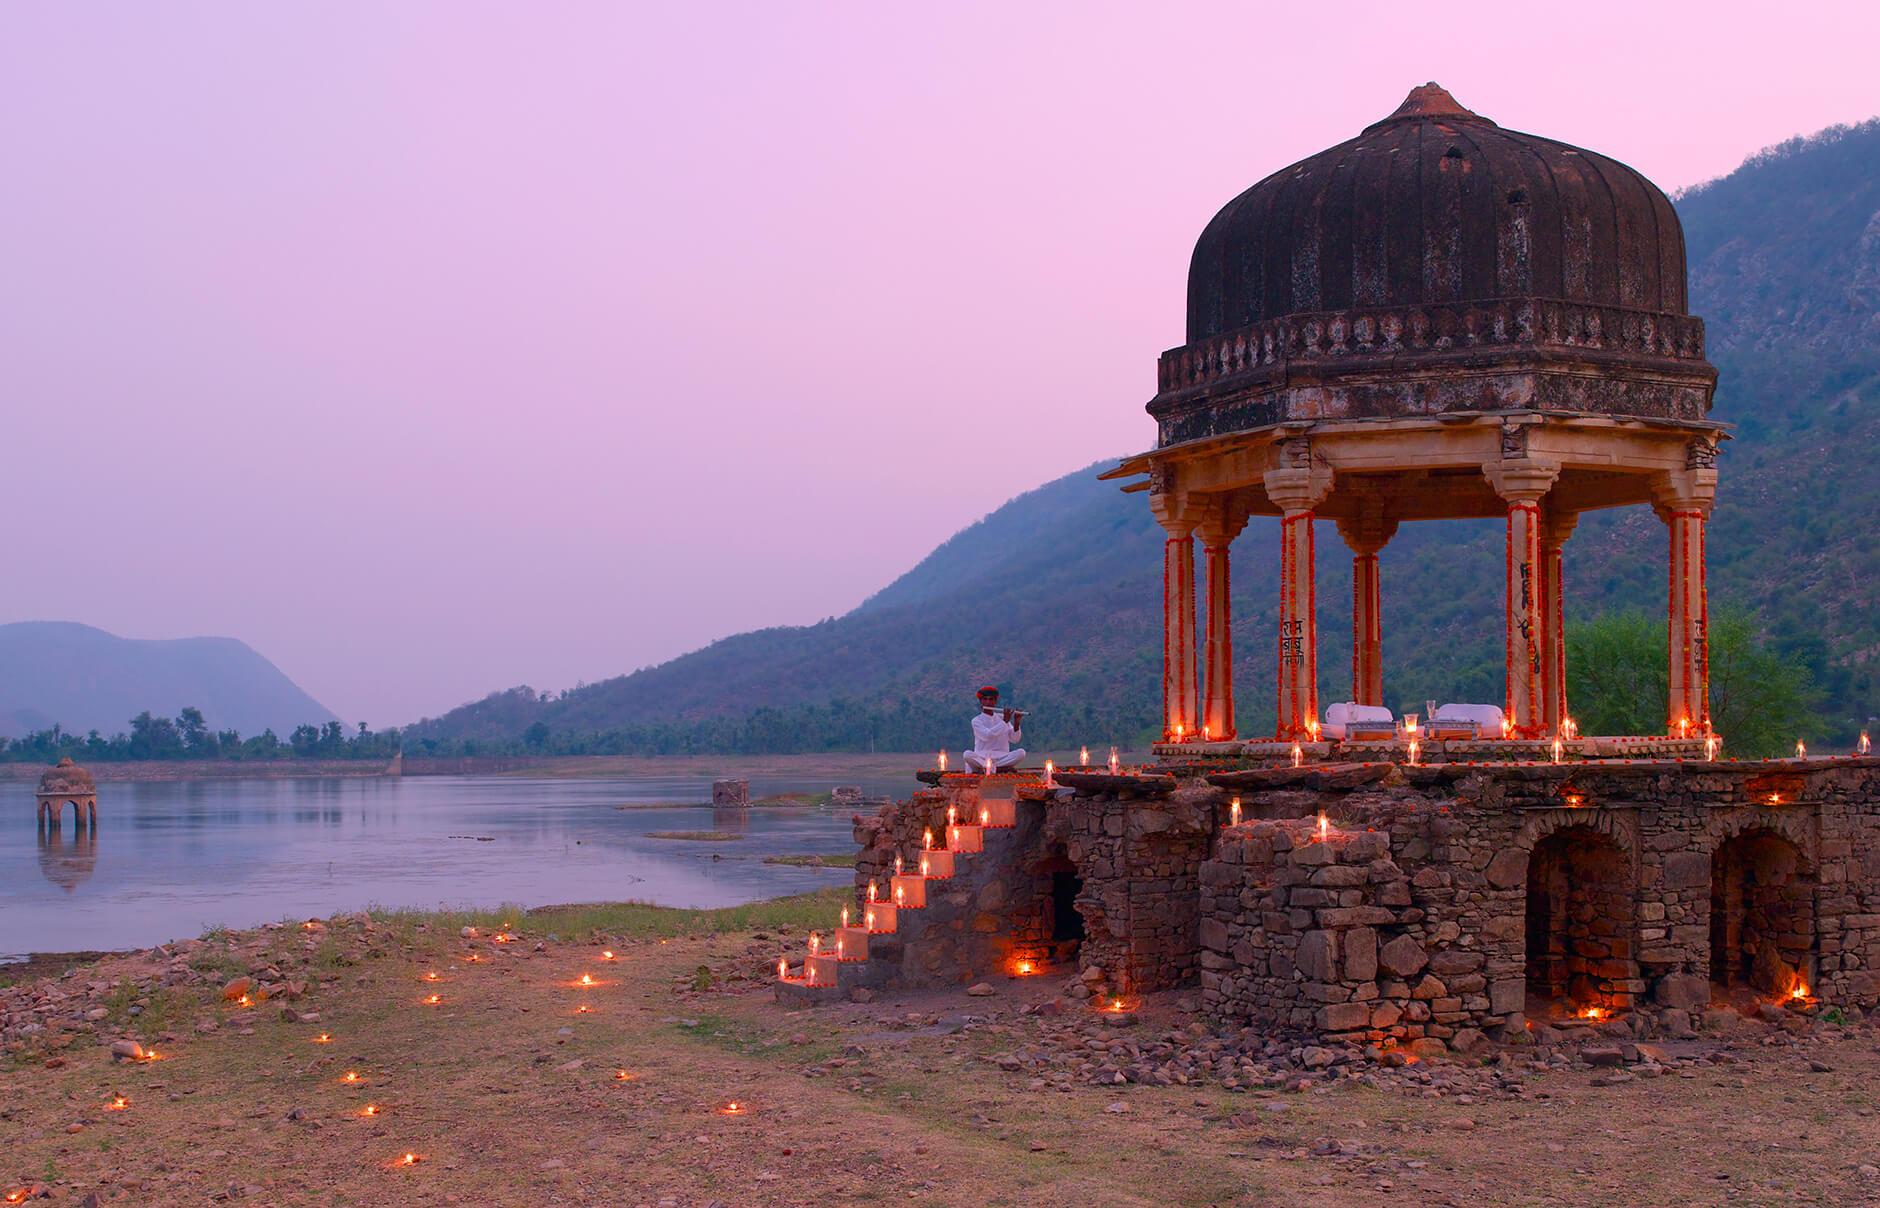 amanbagh-dinner-at-small-chhatri.jpg